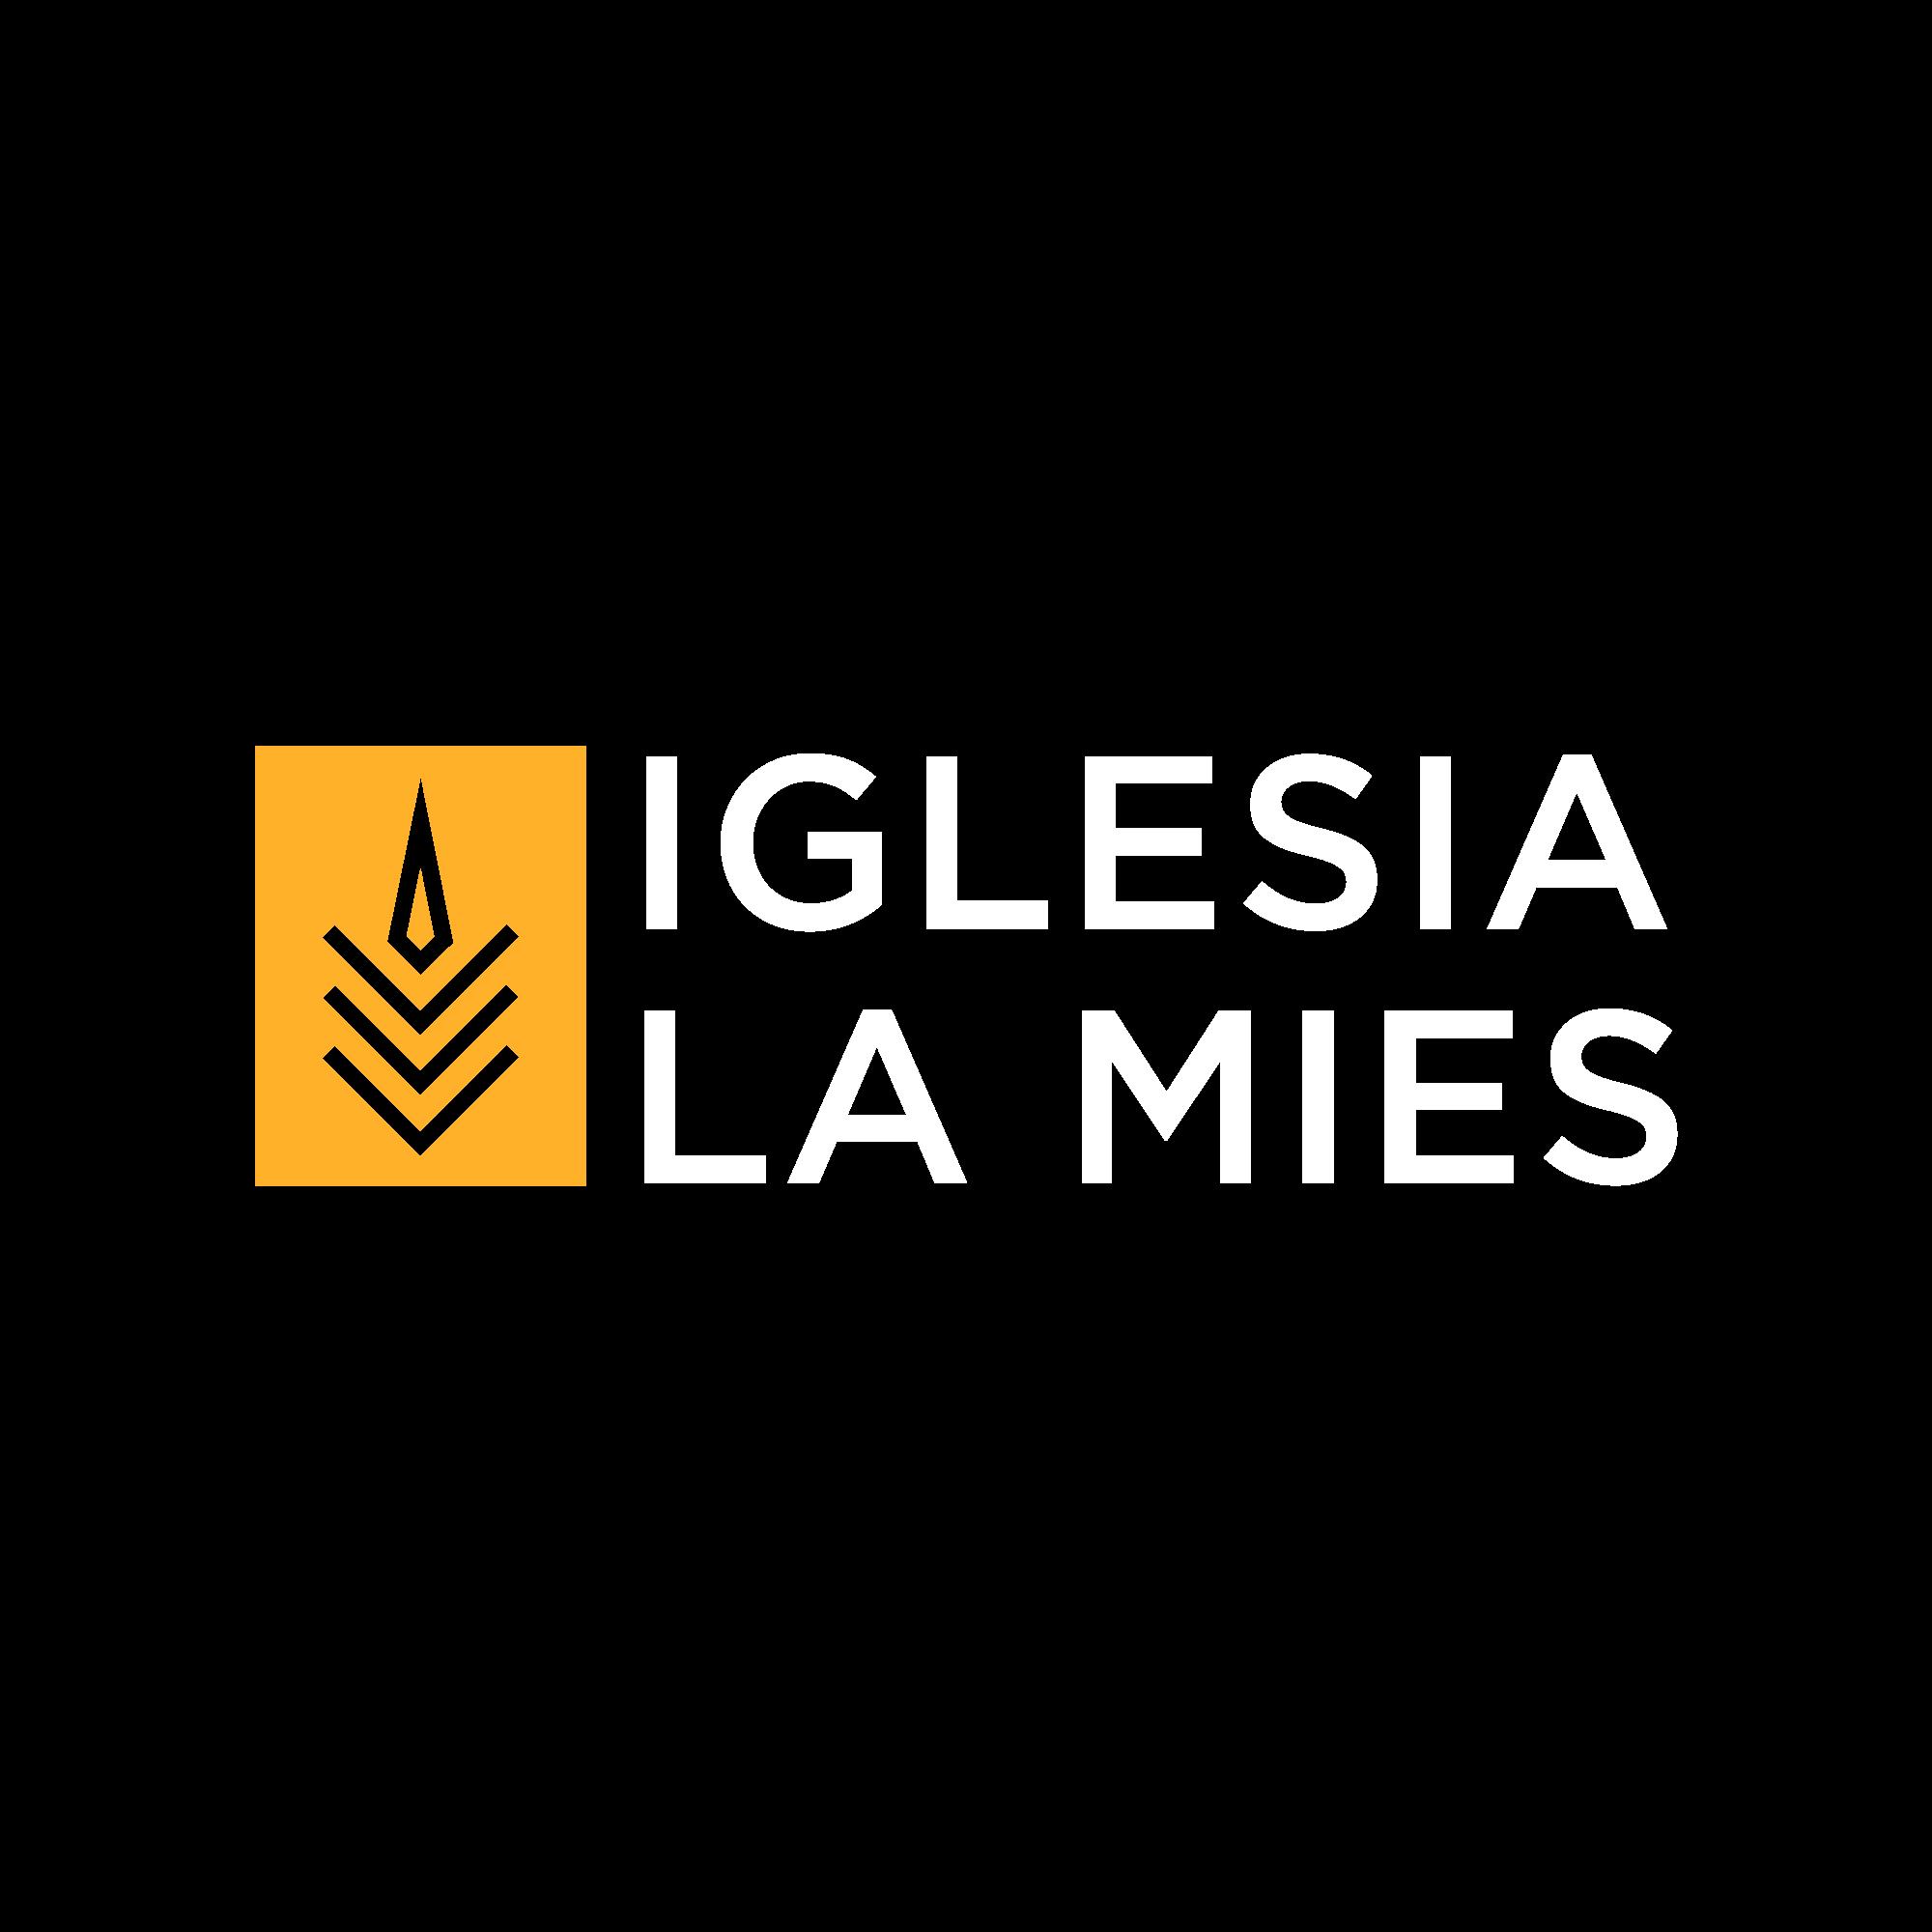 Design a trendy logo for La Mies church (Harvest church)